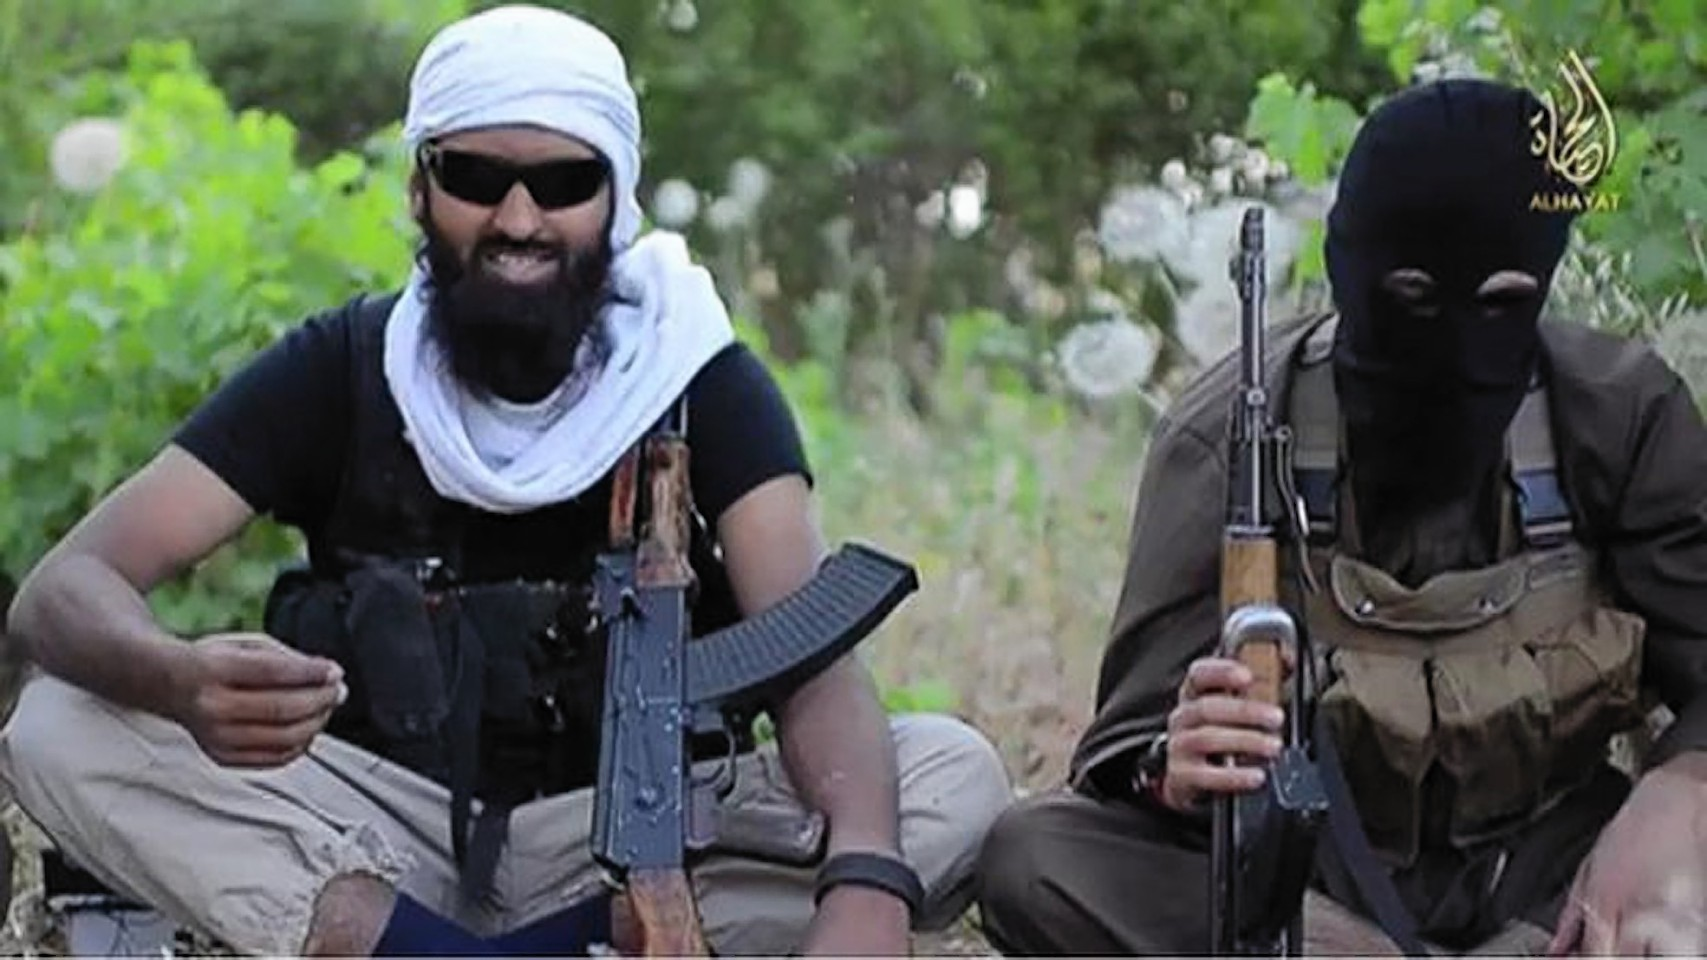 Aberdeen man Abdul Raqib Amin was fighting with IS